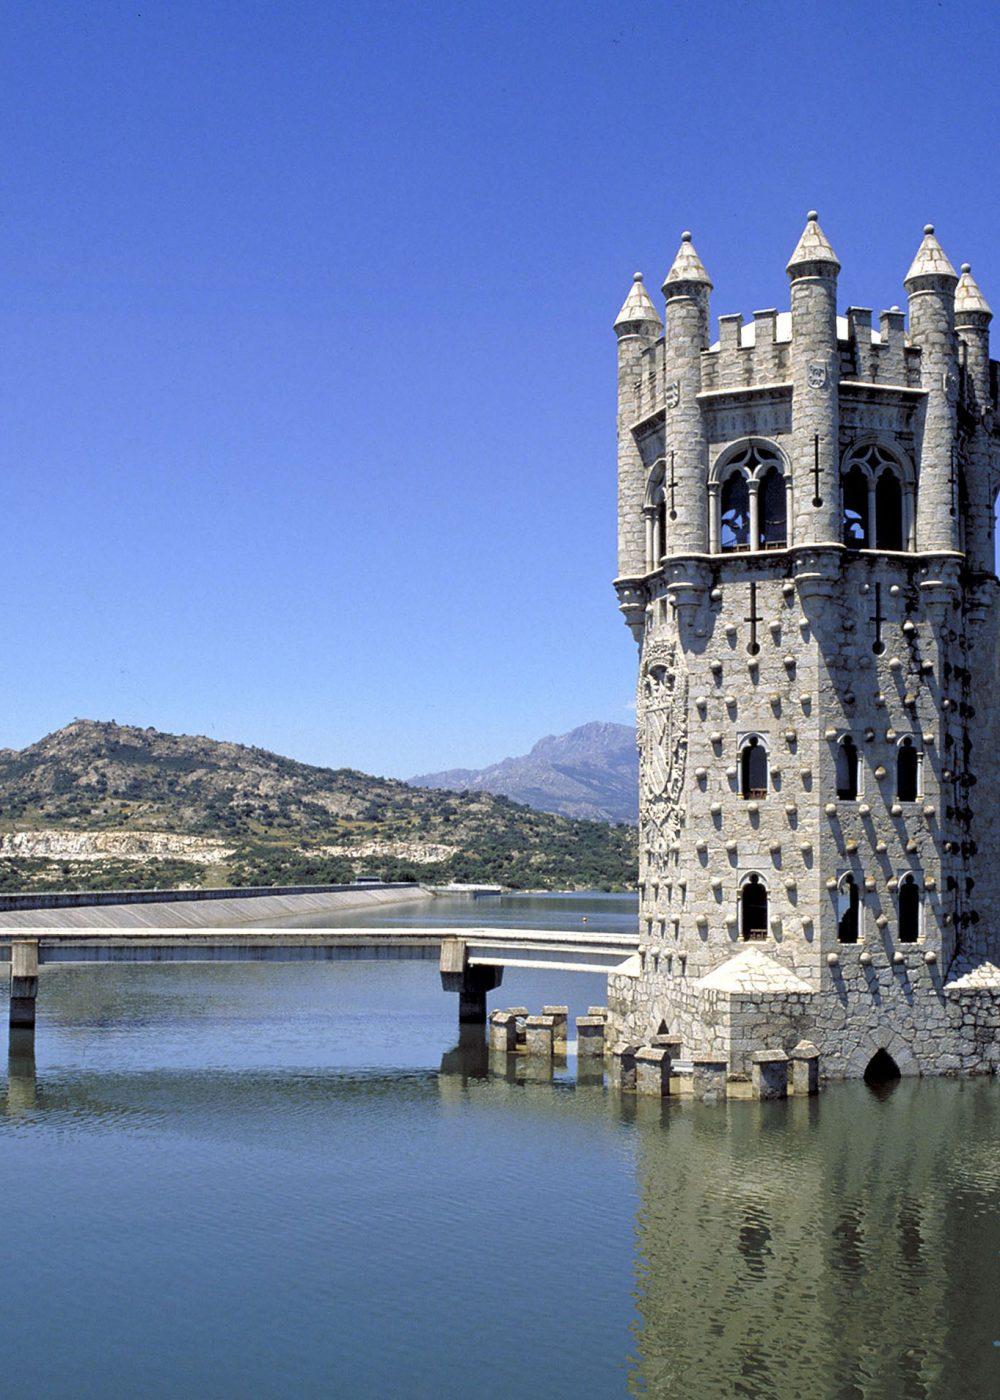 Canal de Isabel II, Embalse de Manzanares el Real (torre de toma)